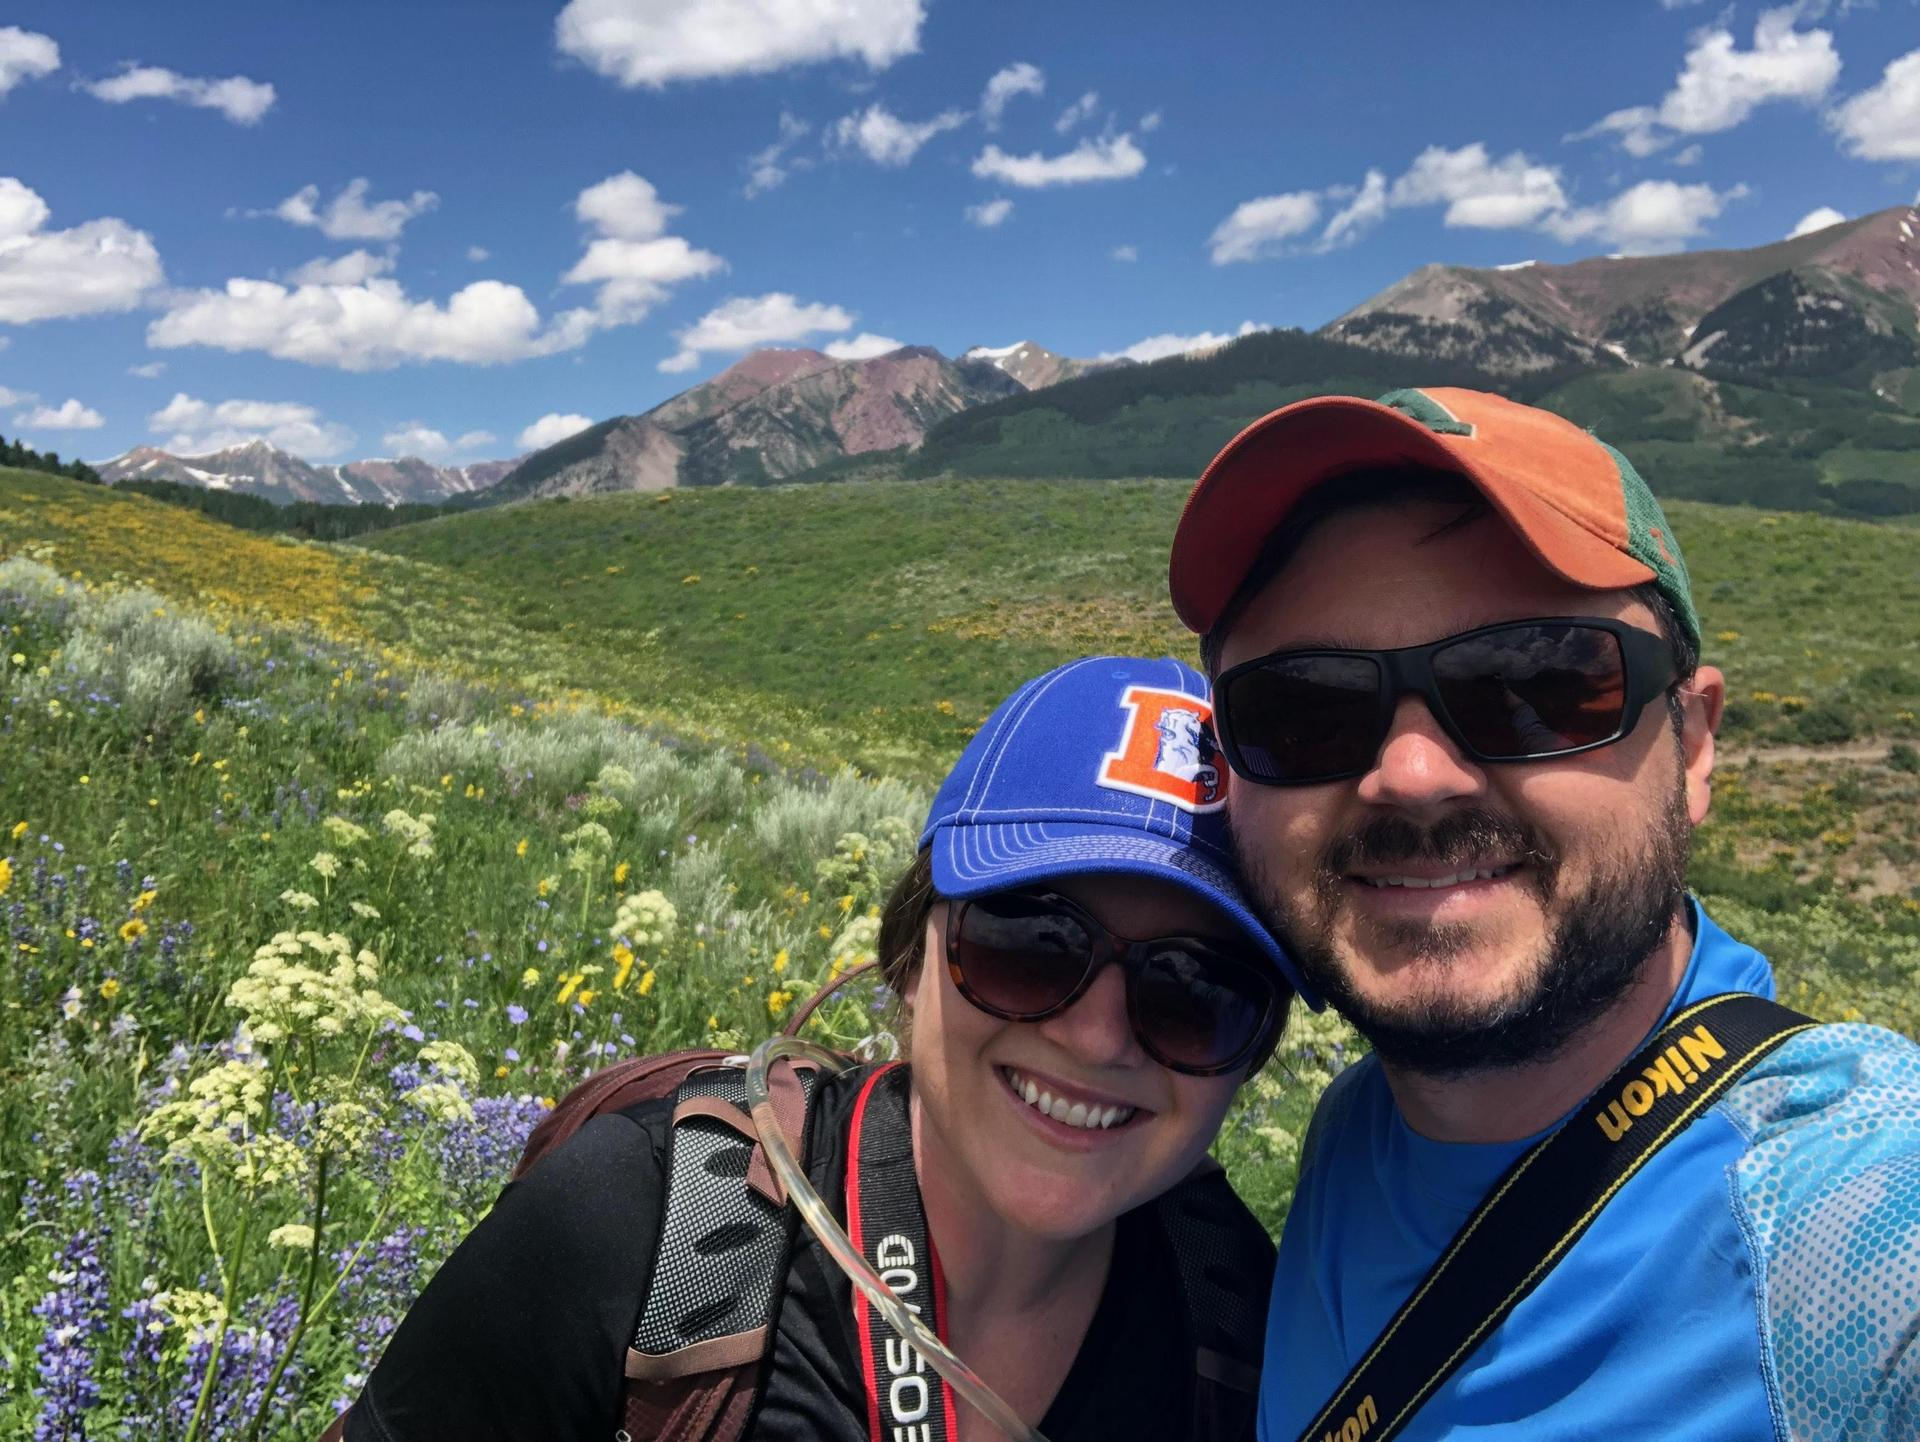 Hiking with my fiance